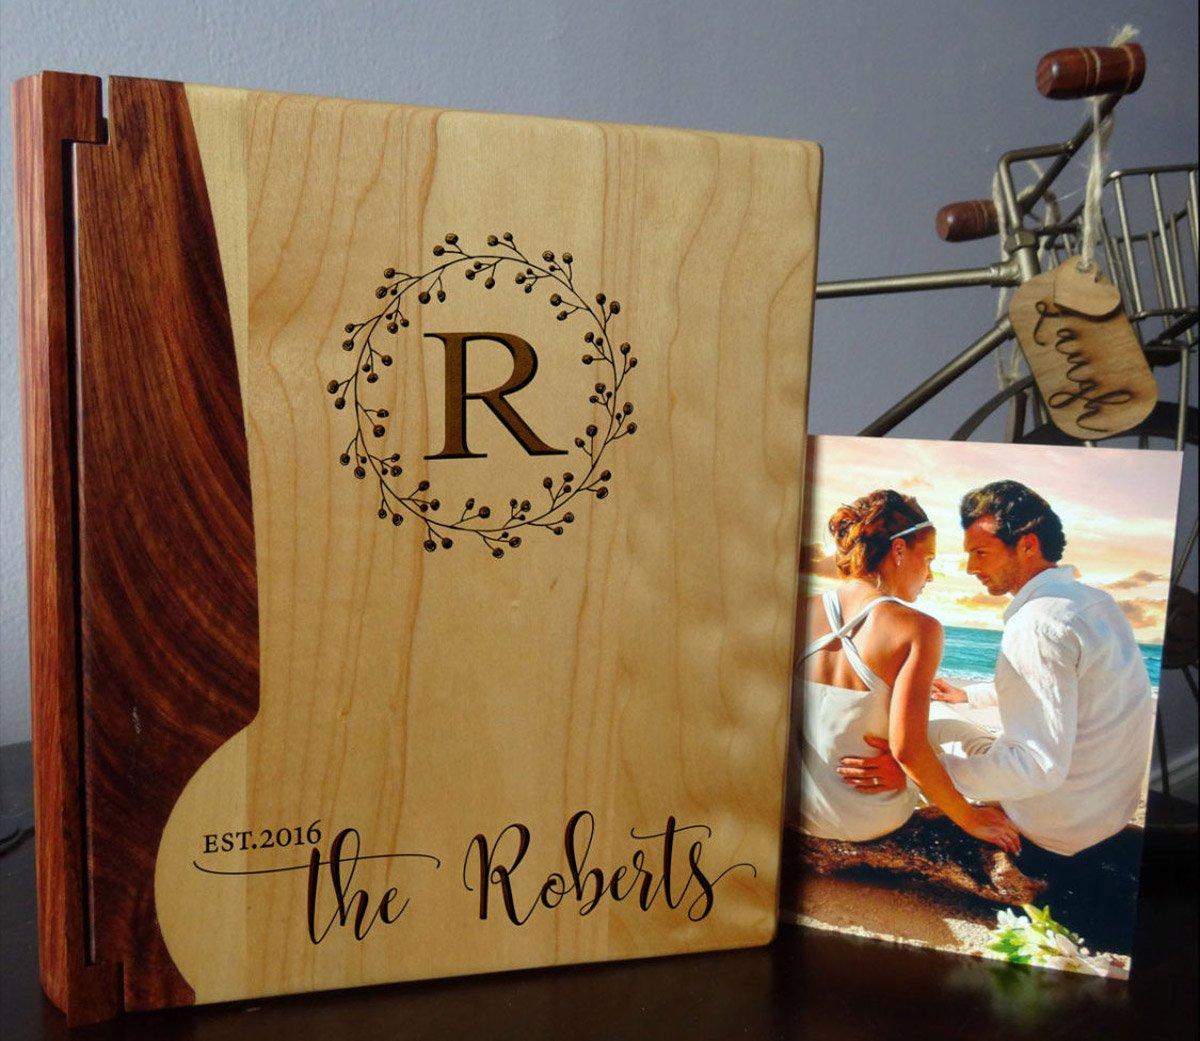 LoveToCreateStamps Personalized Wood Cover Photo Album, Custom Engraved Family Monogram Wedding Album, Style 176 (Maple & Rosewood Cover) by LoveToCreateStamps